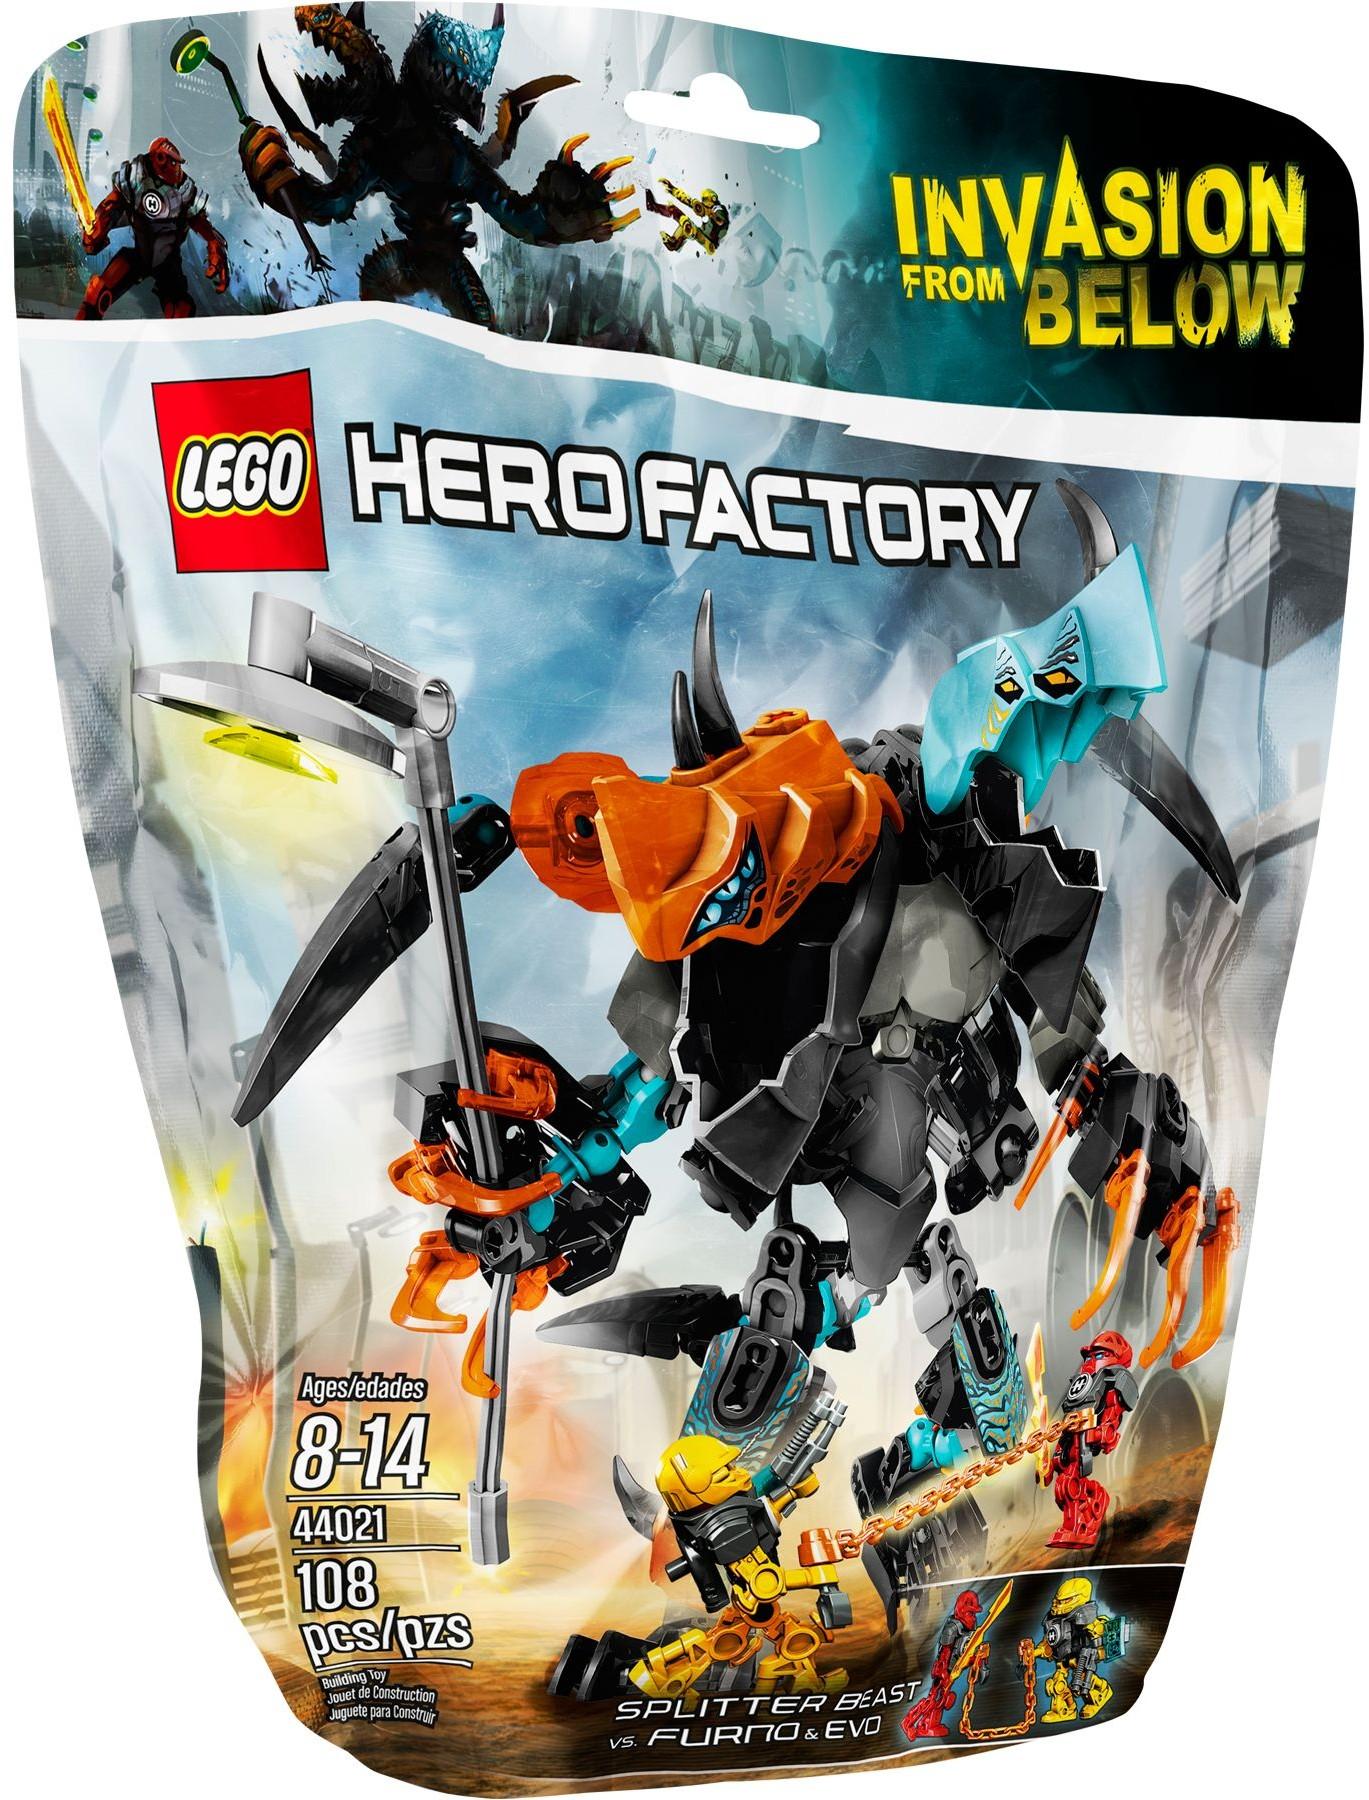 LEGO Hero Factory 44021 Dvojatec versus Furno & Evo